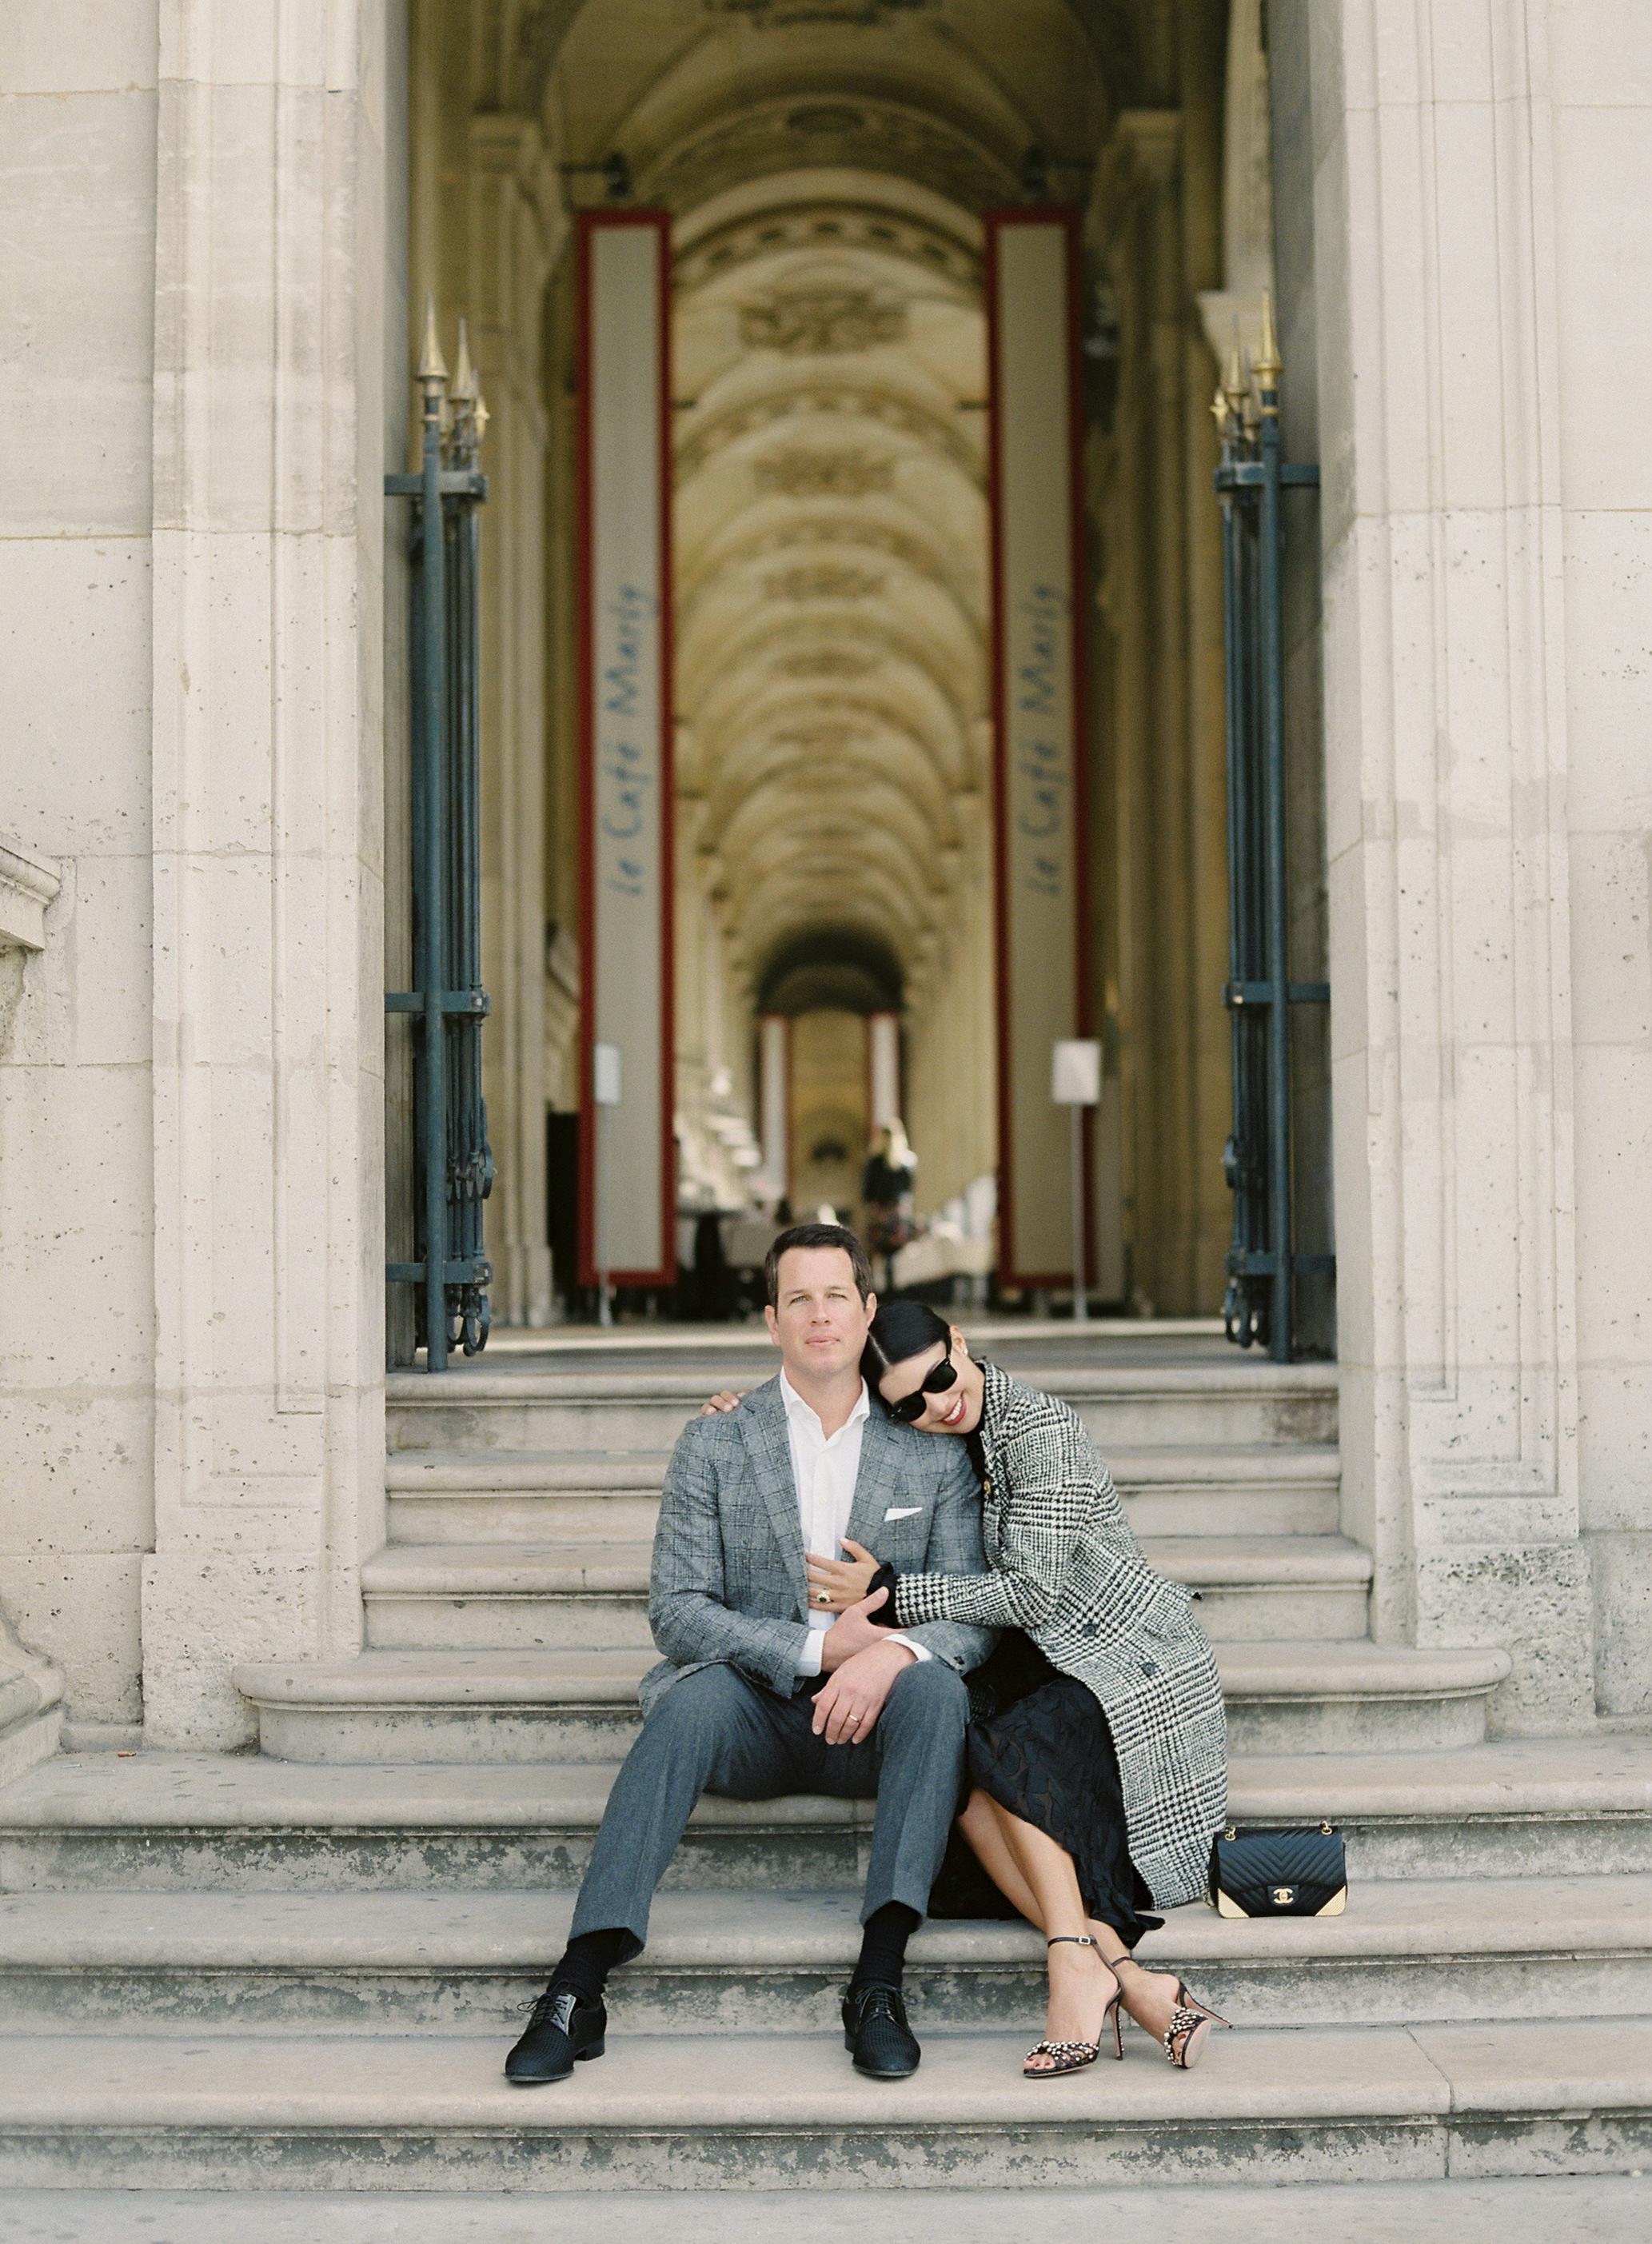 Paris engagement photography-Carrie King Photographer-10.jpg